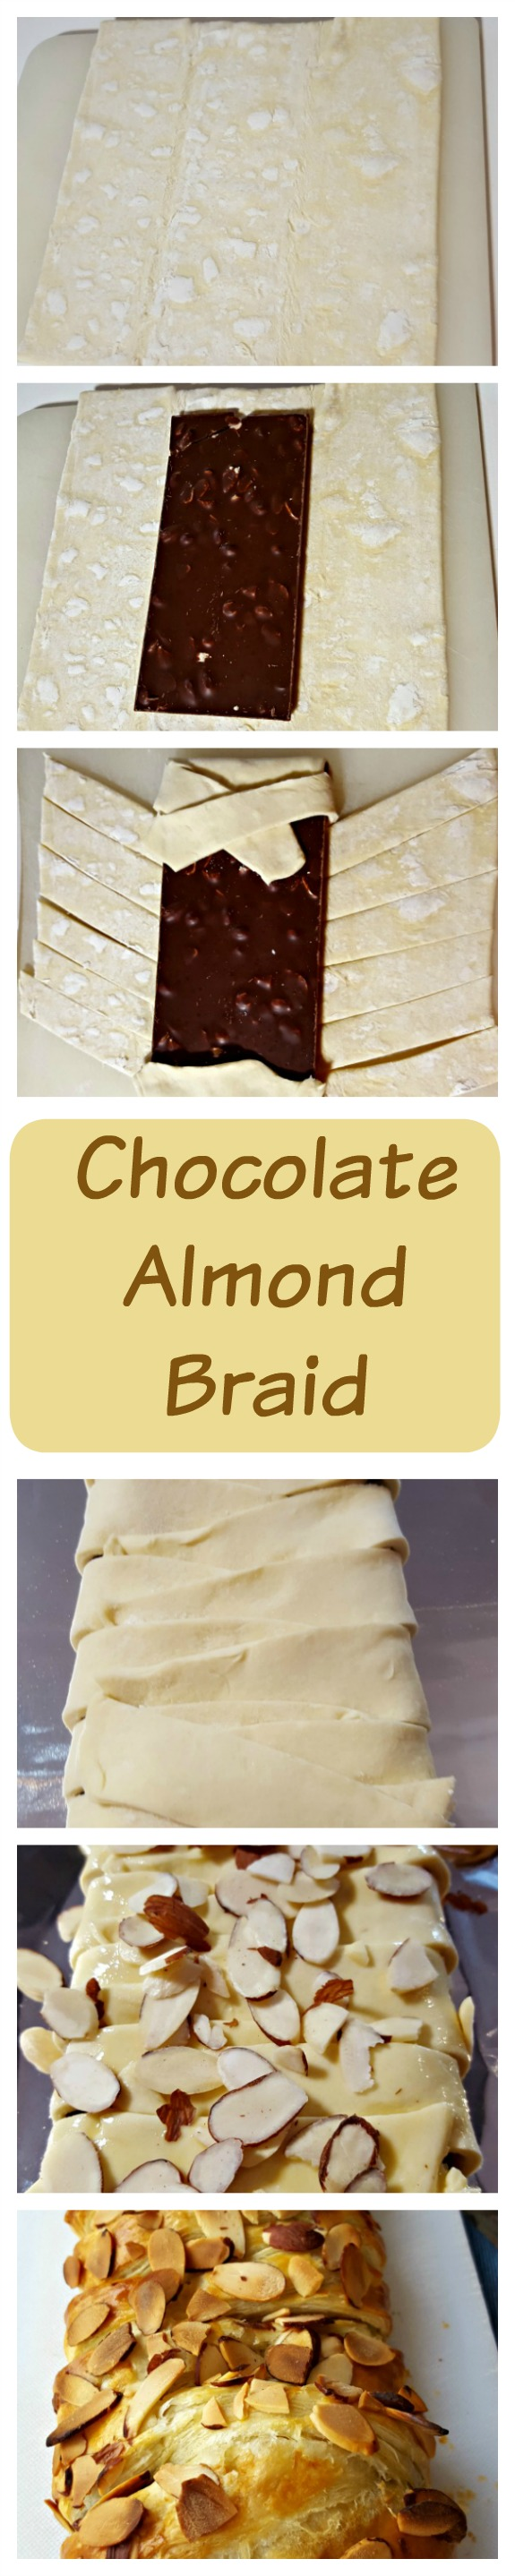 Chocolate Almond Braid